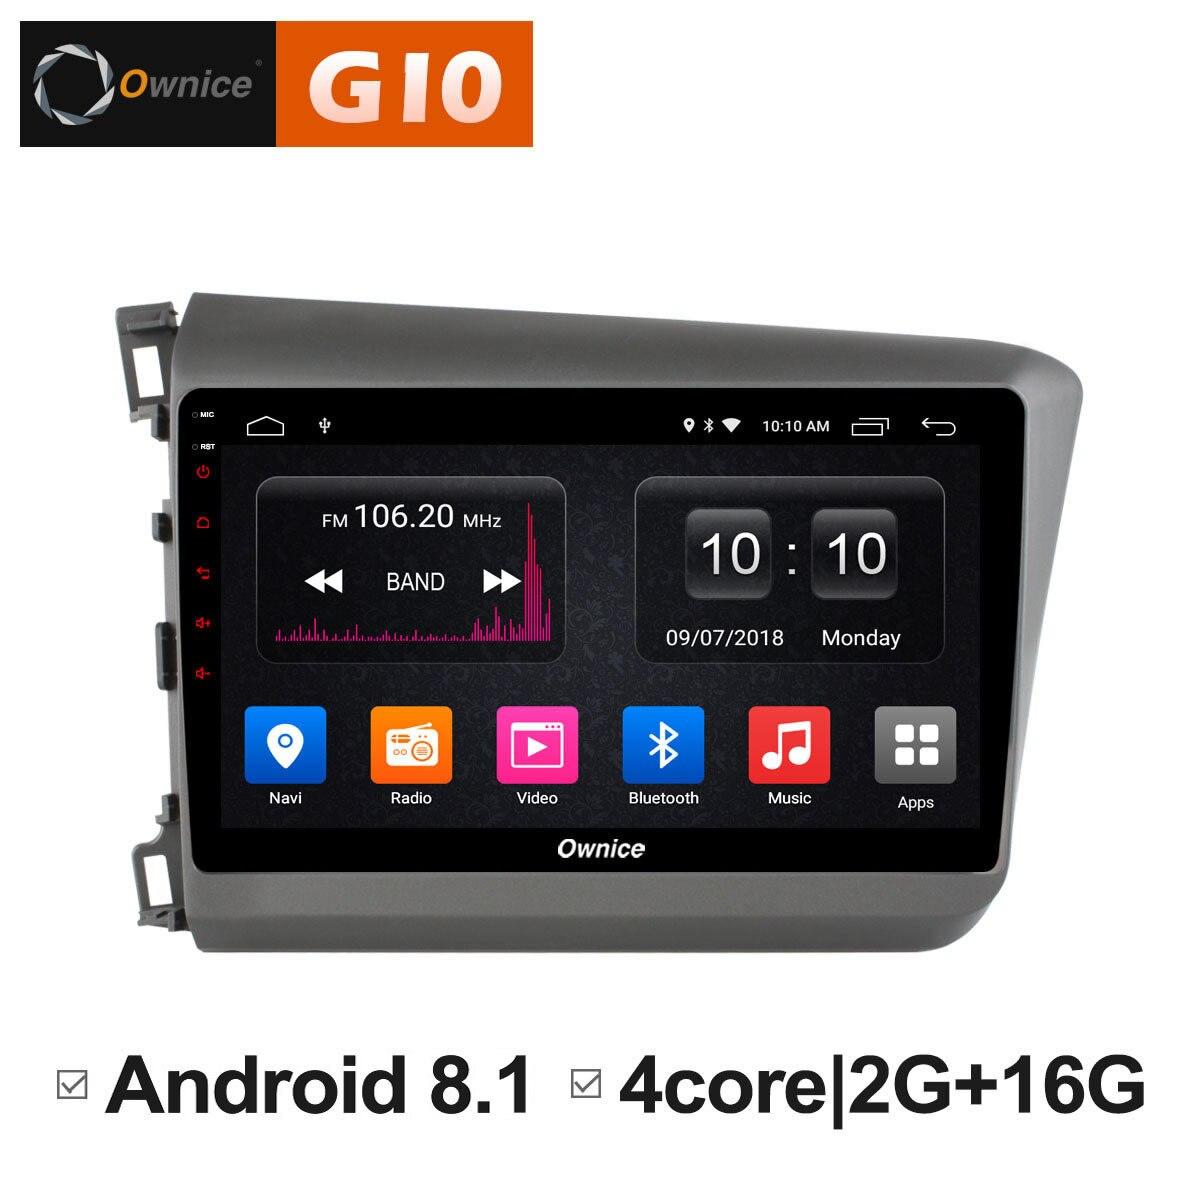 Android 8.1 HeadUnit Car 2 din Radio Video Multimedia player GPS Navigation For Honda Civic 2011 2012 2013 2014 2015 4G DAB+ DVD jdaston android 6 0 2 din car radio for ford fiesta 2008 2009 2010 2011 2012 2013 2014 2015 car multimedia gps video dvd player